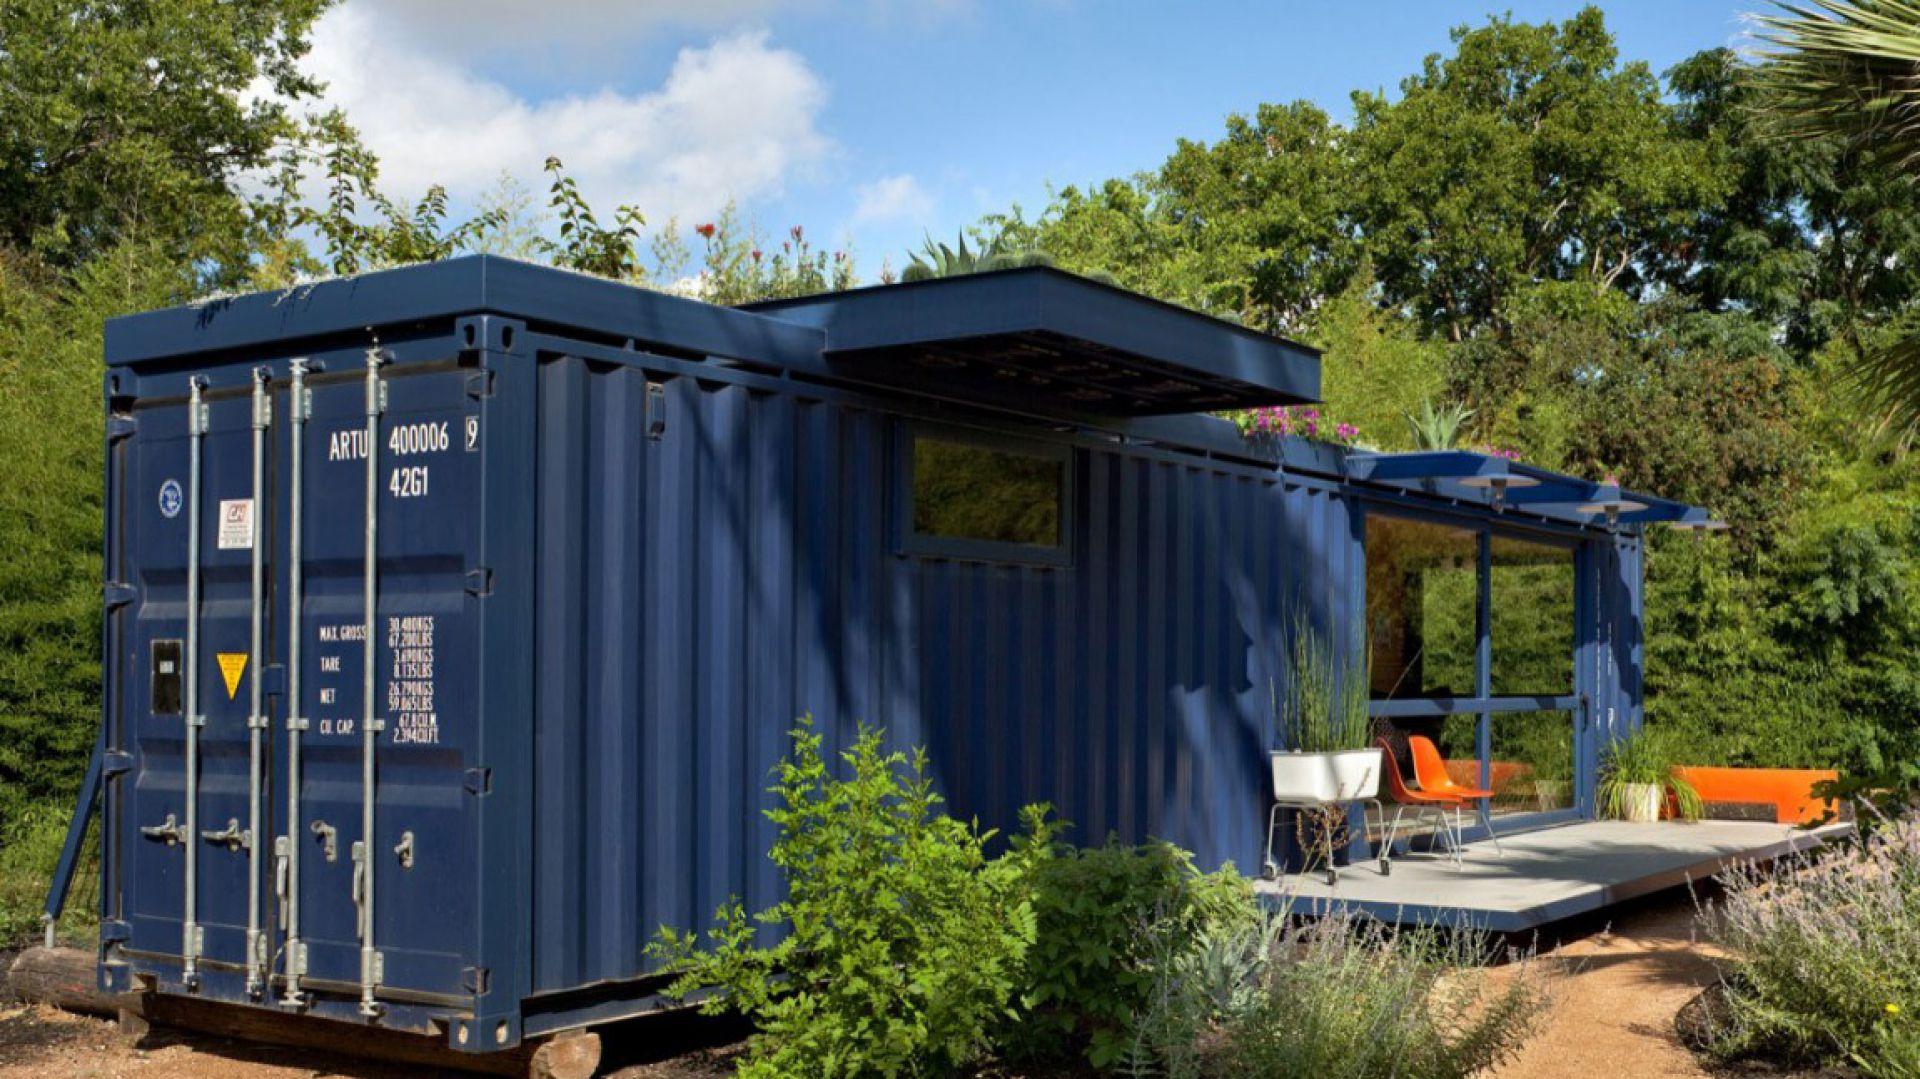 Projekt: Poteet Architects, http://www.poteetarchitects.com/. Zdjęcia: Chris Cooper